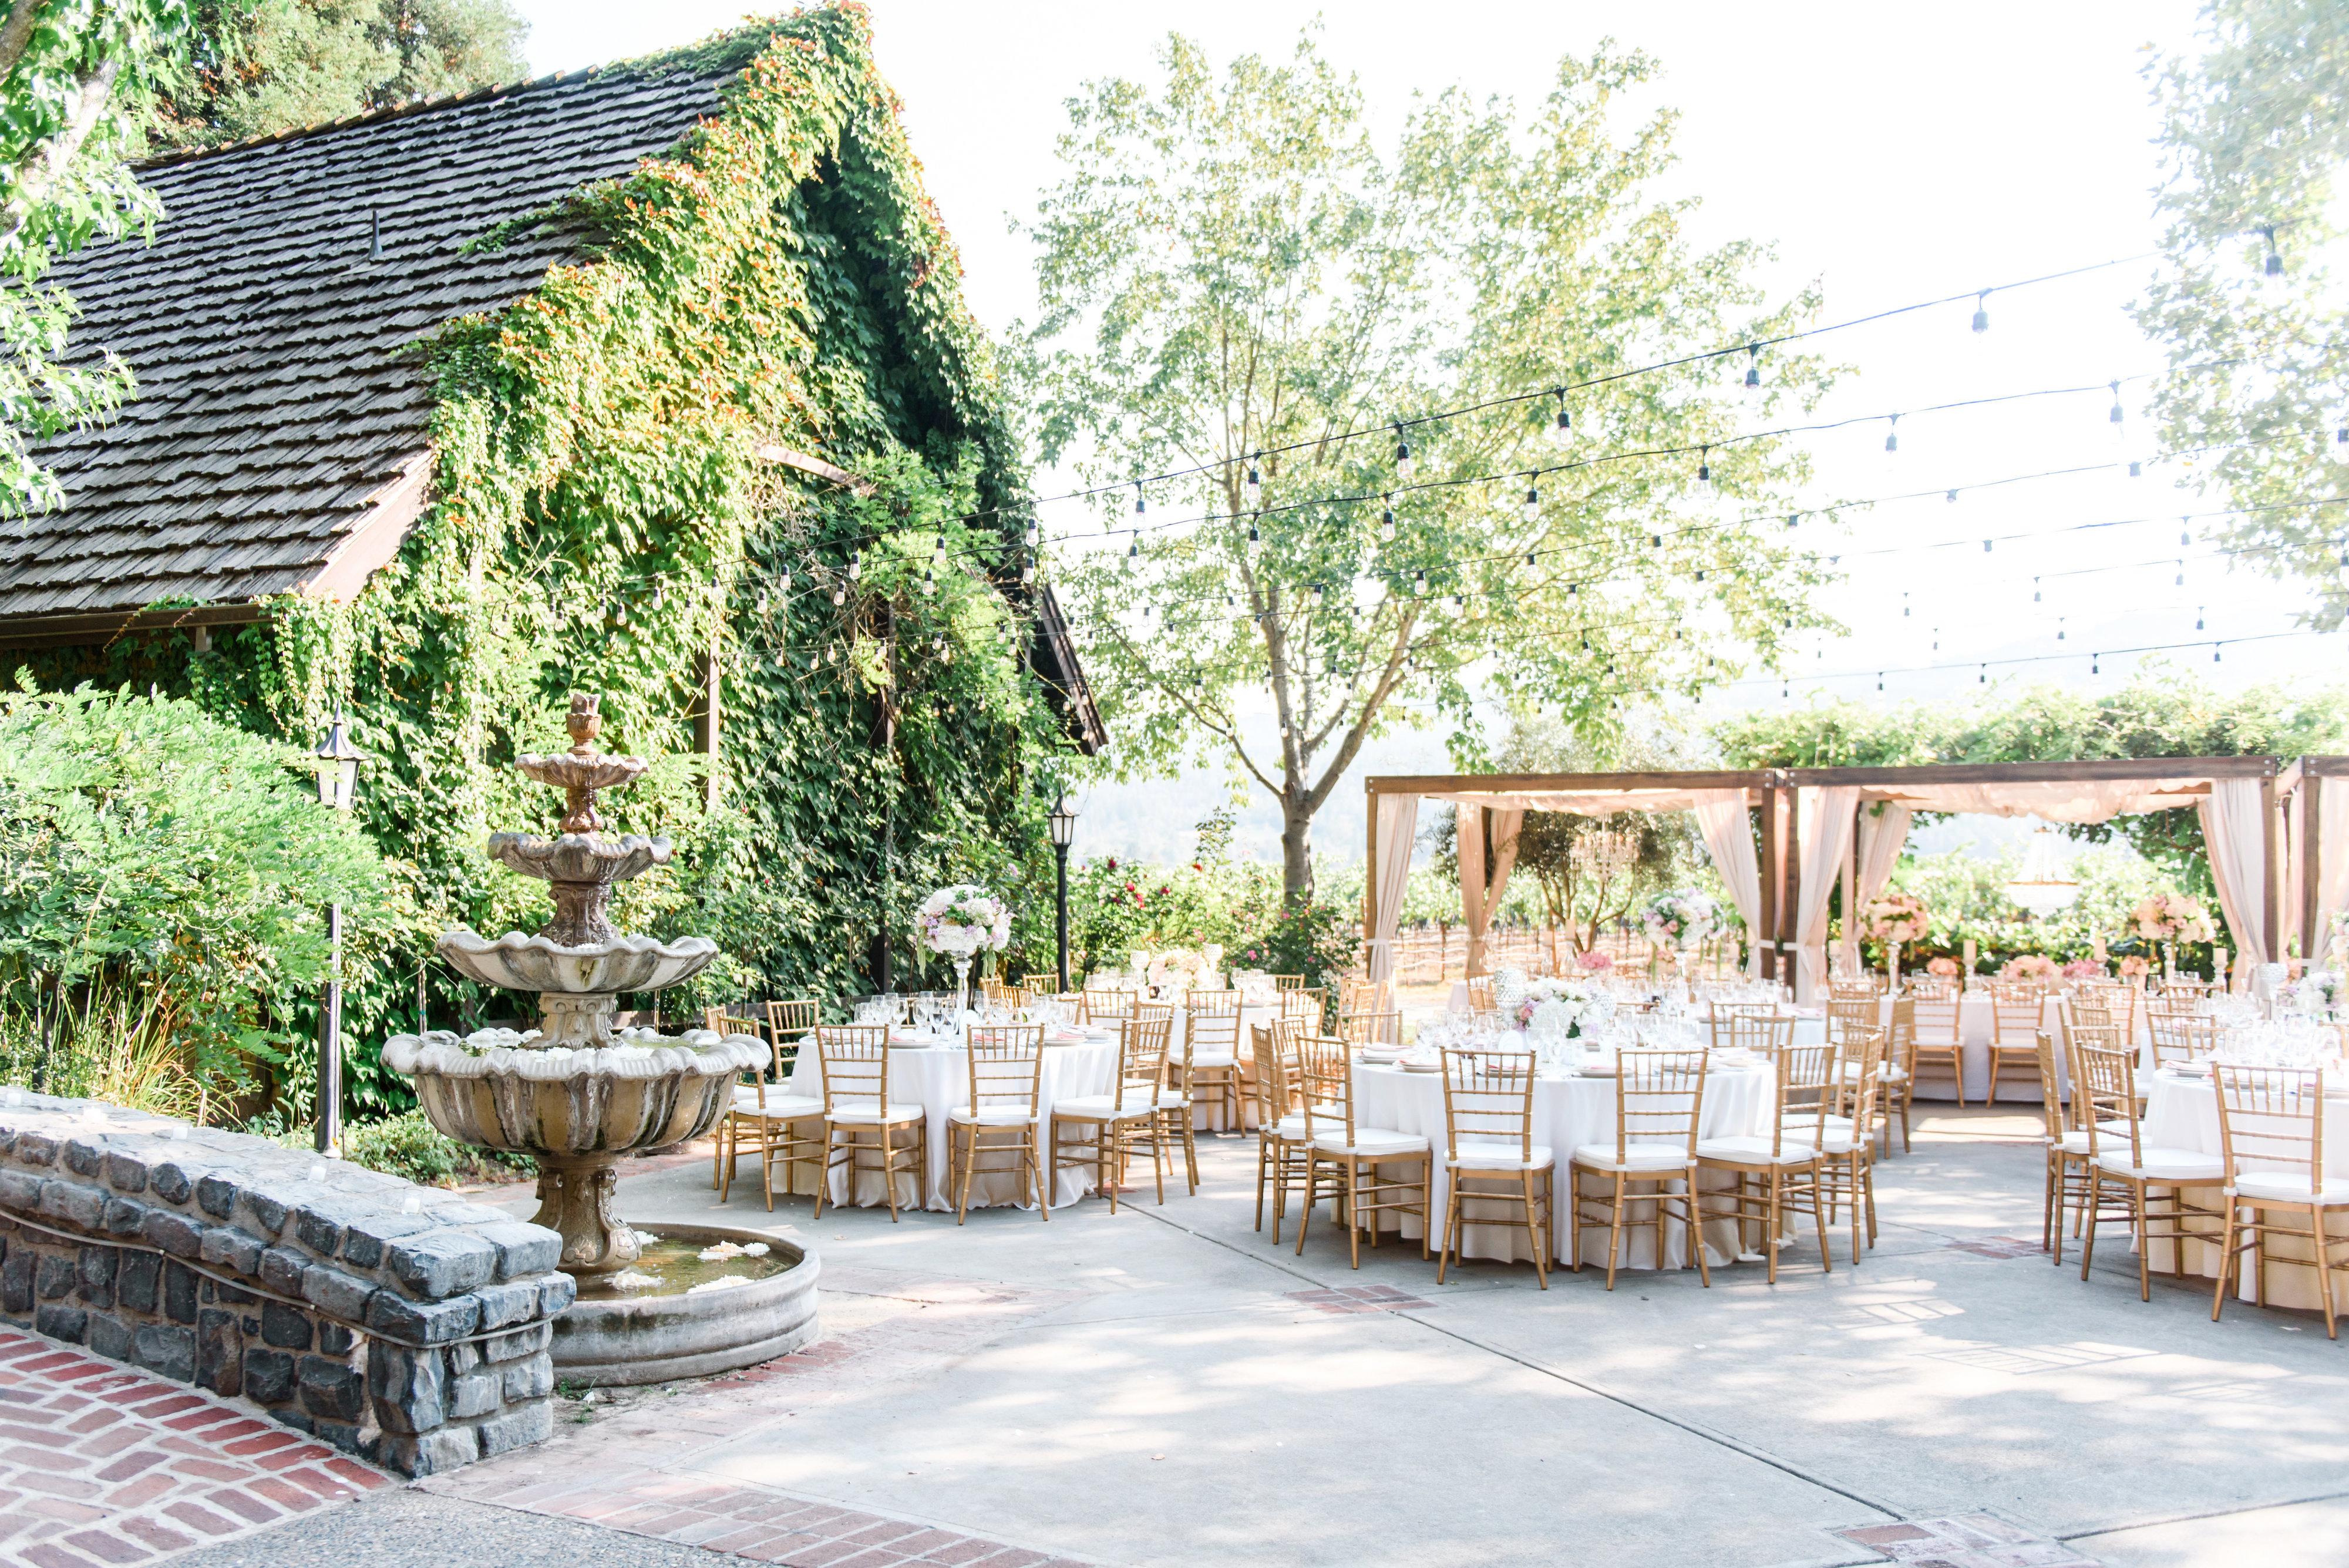 Harvest Inn Napa Blush Luxe Wedding - Weddings by Scott & Dana